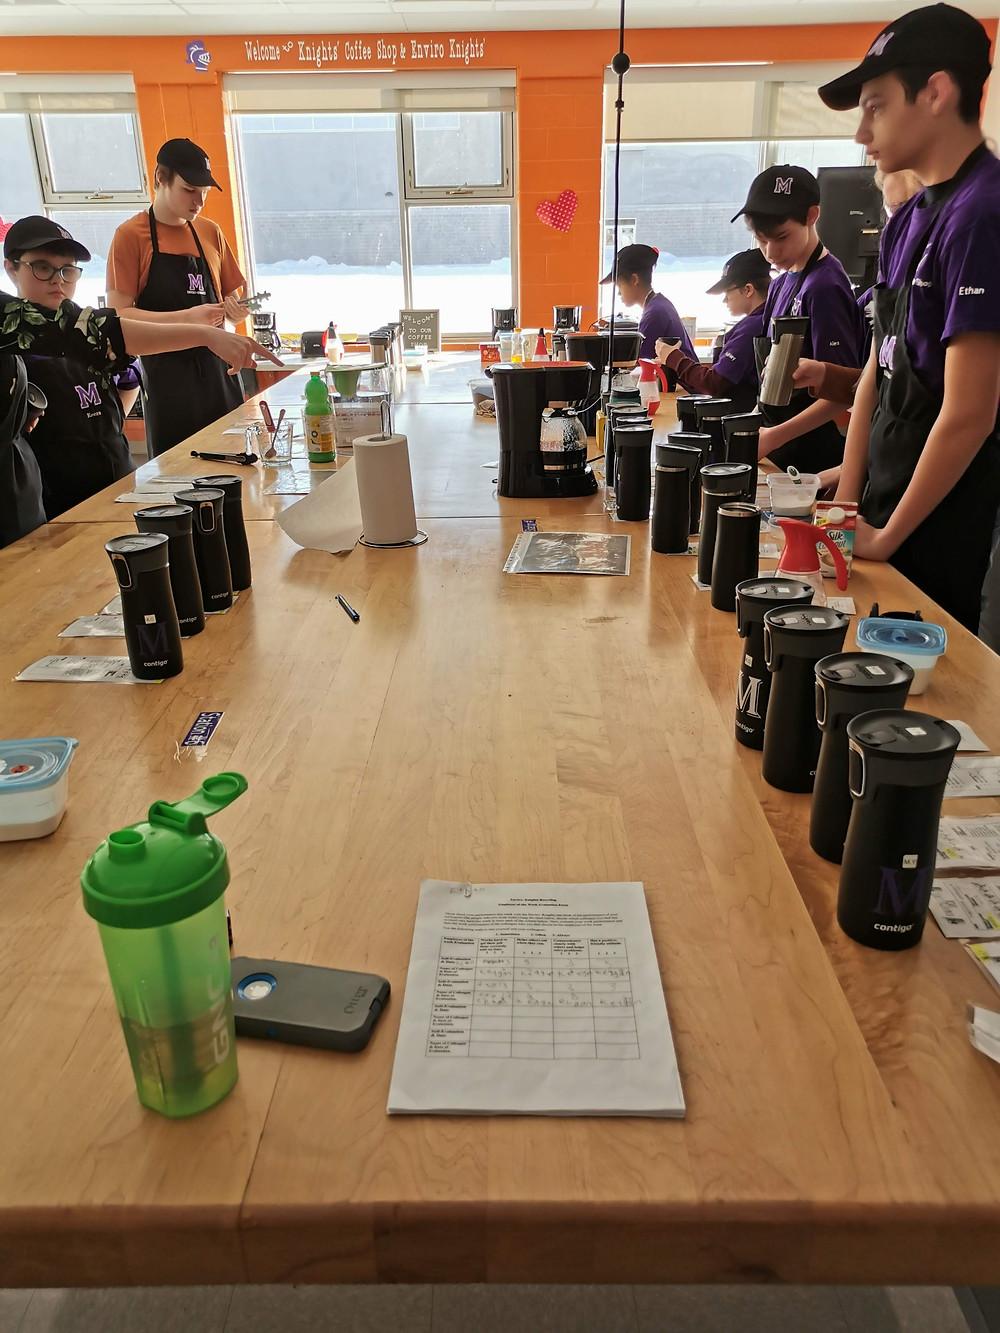 coffee station set up